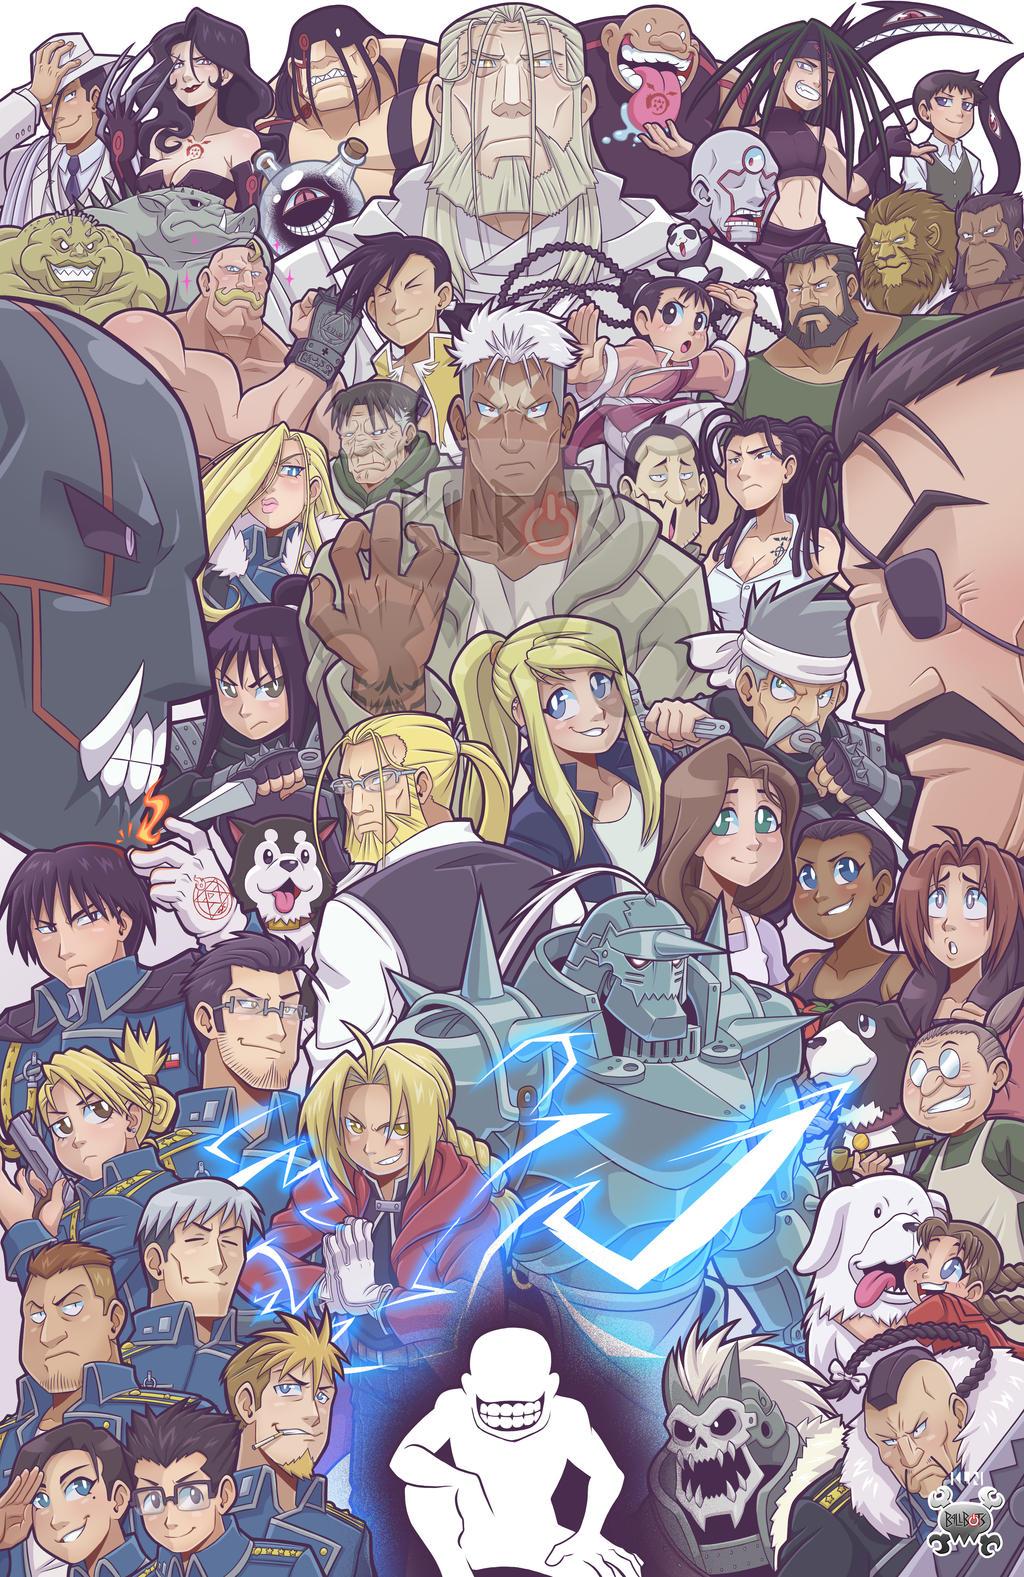 View Fullmetal Alchemist Brotherhood Official Poster Pics